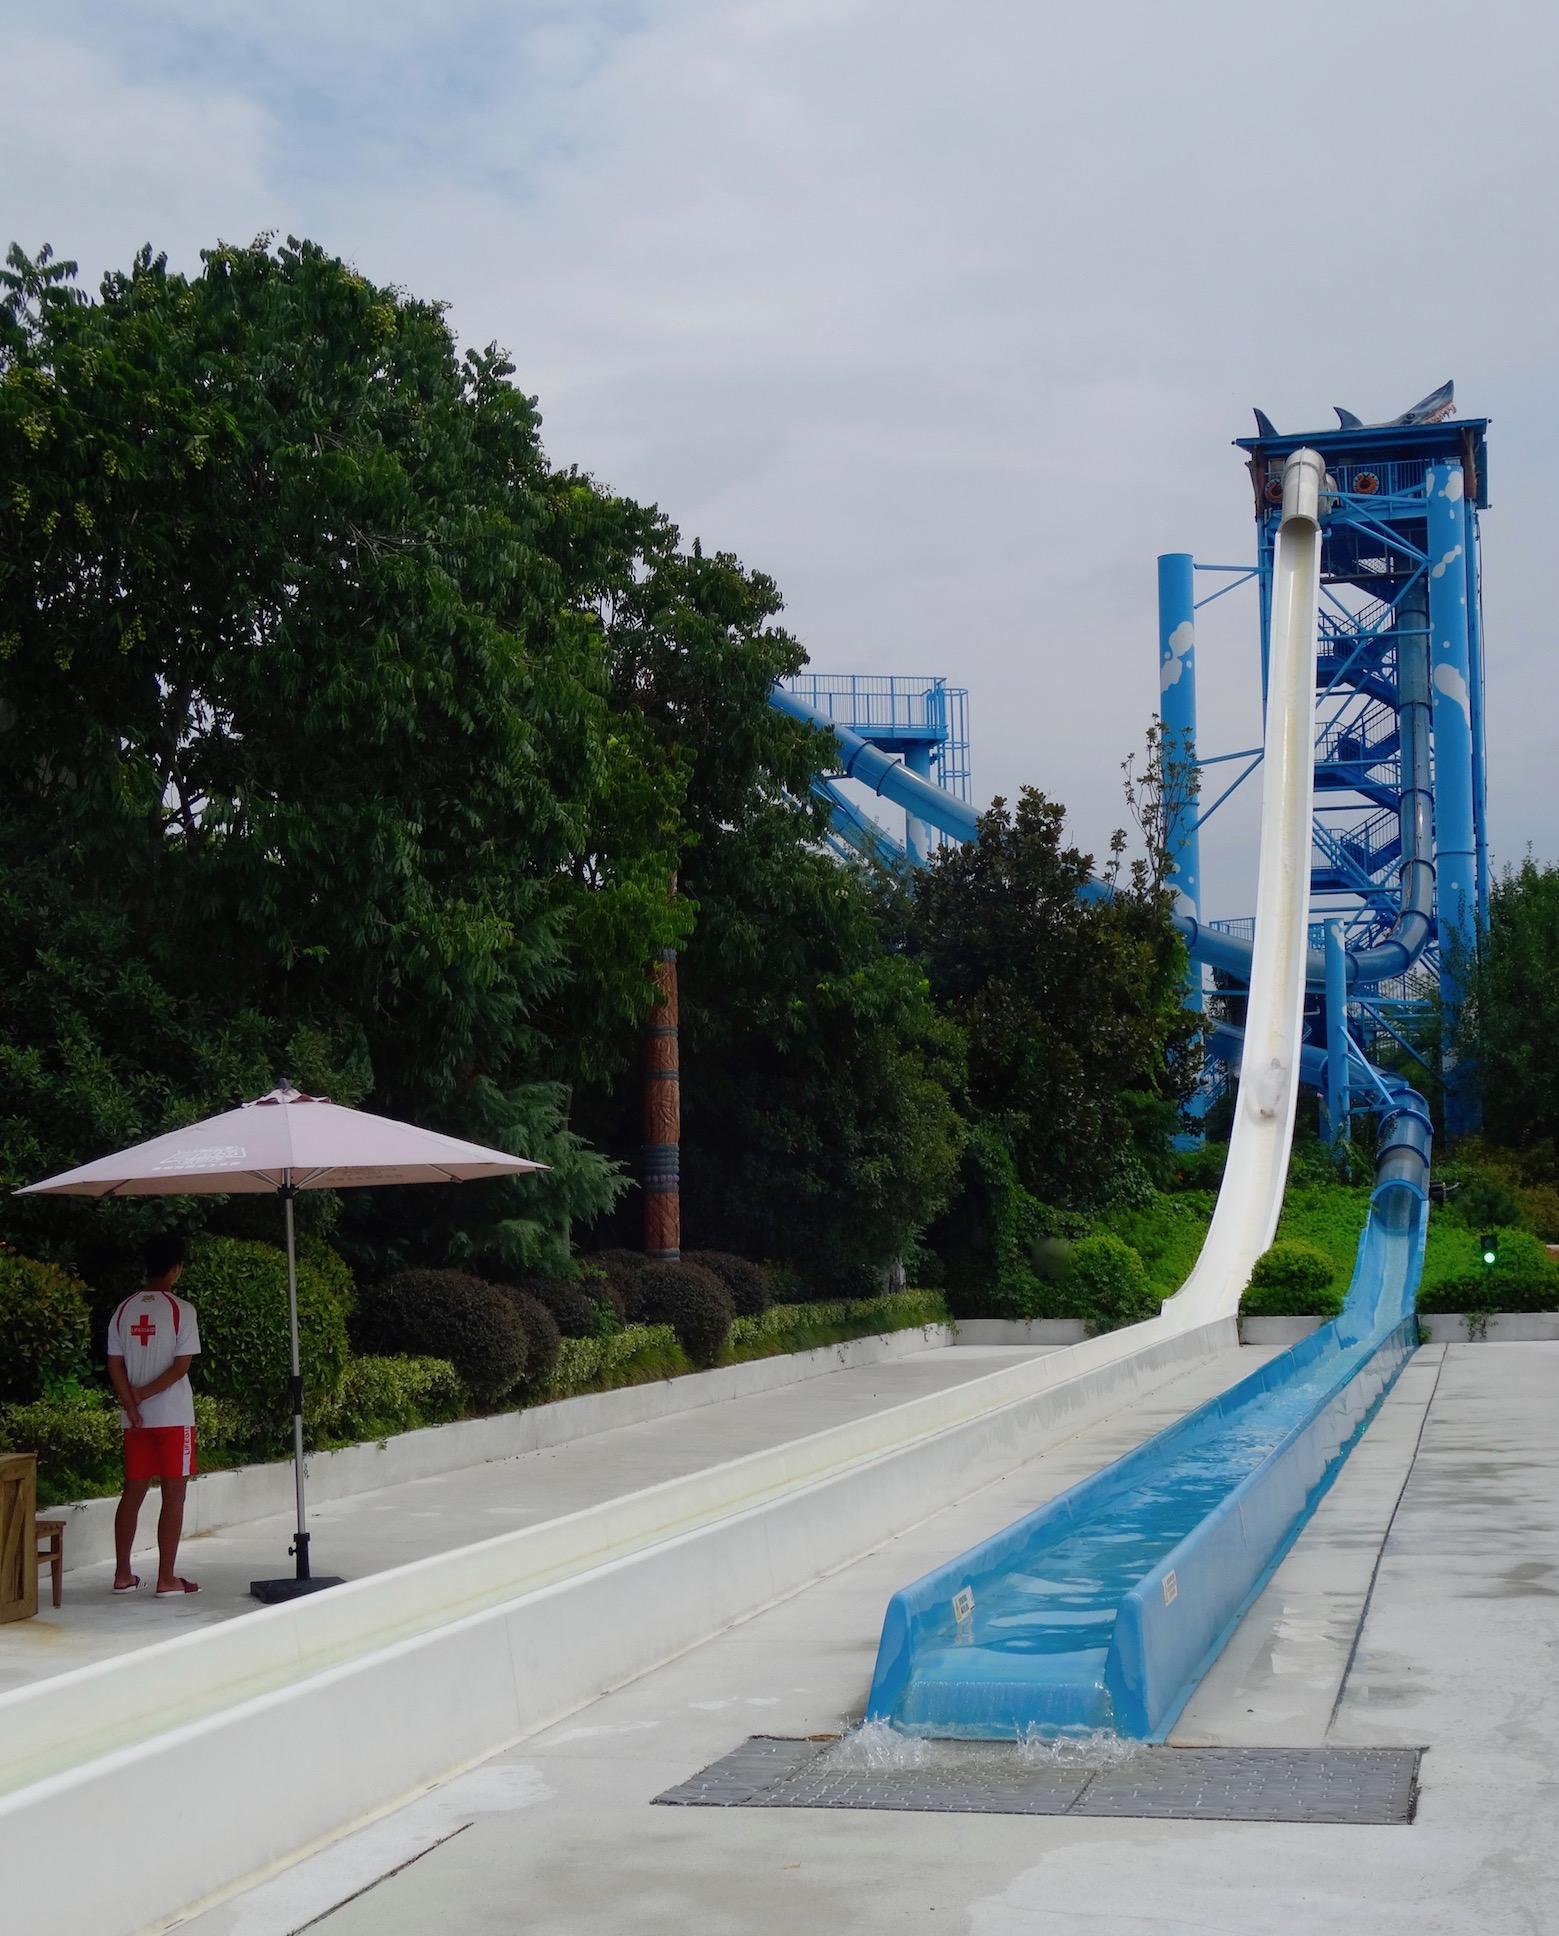 The Aqua Loop Lishui Adventure Island Water World Zhejiang Province China